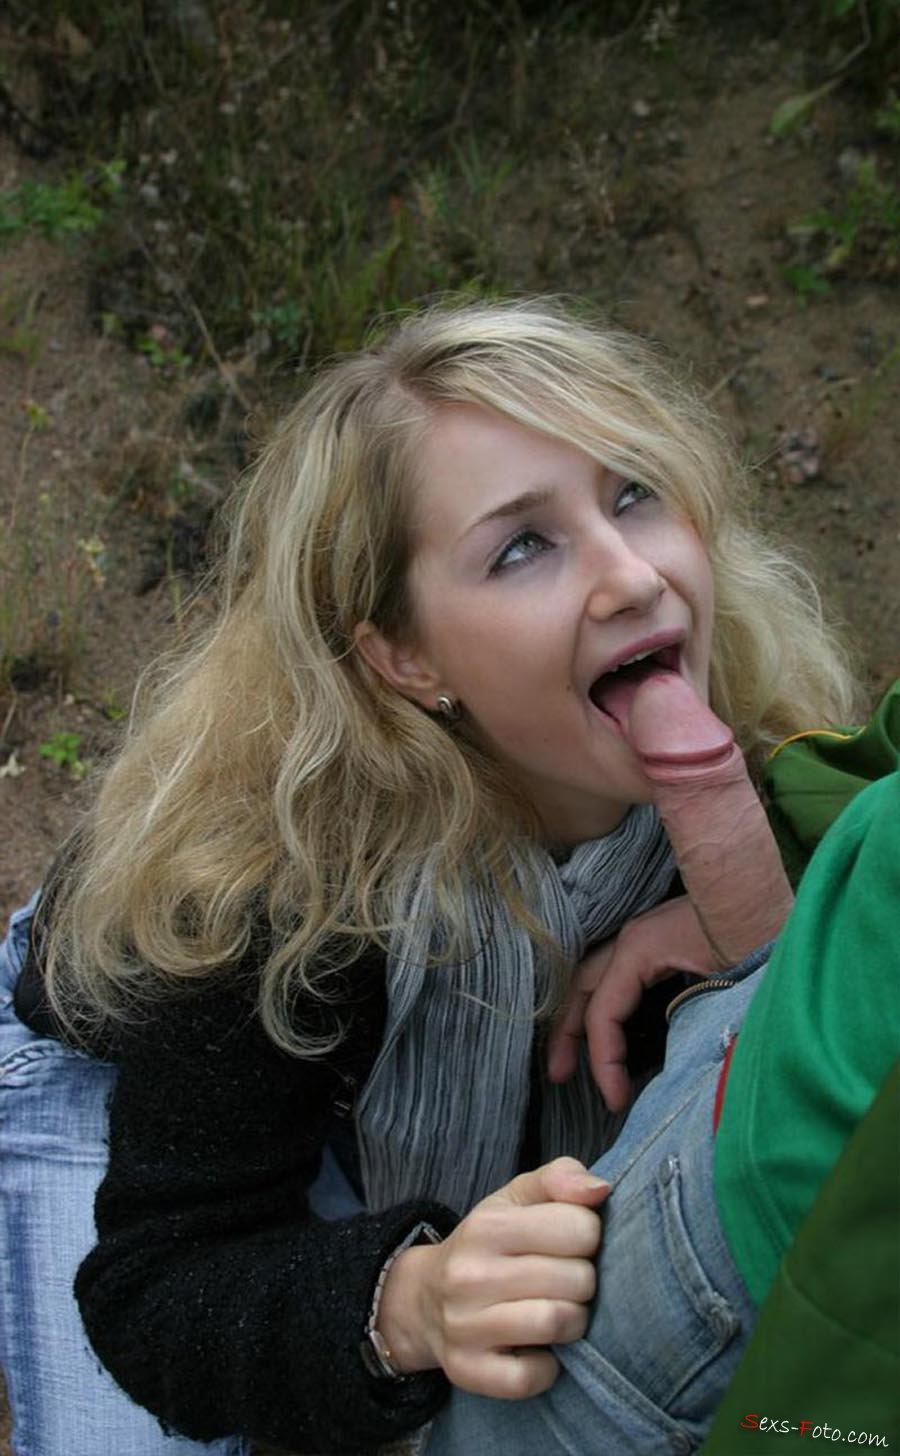 Секс на улице на морозе в подворотне, порно каприс фото эротика